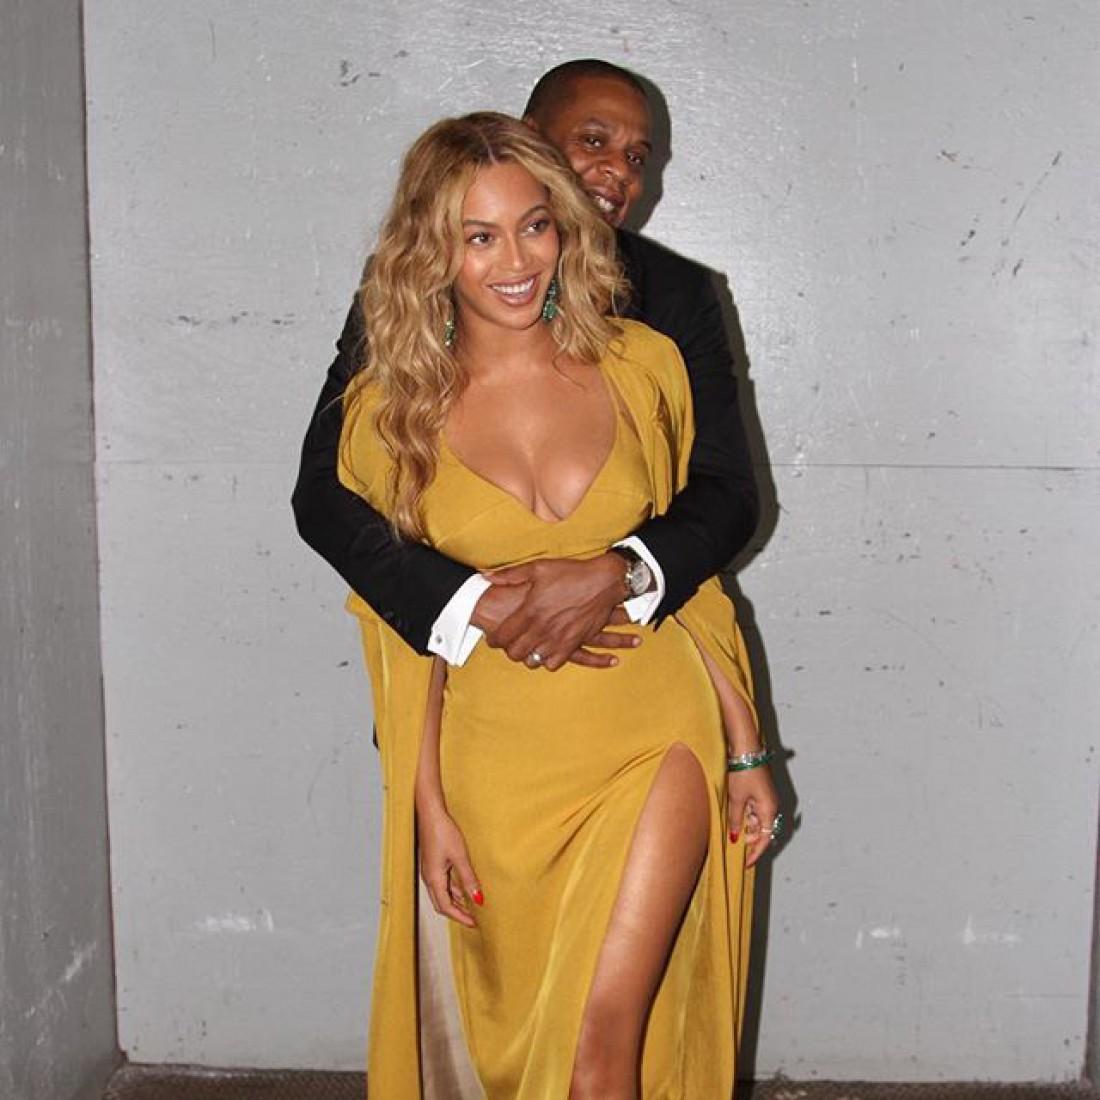 История любви Бейонсе и Jay-Z